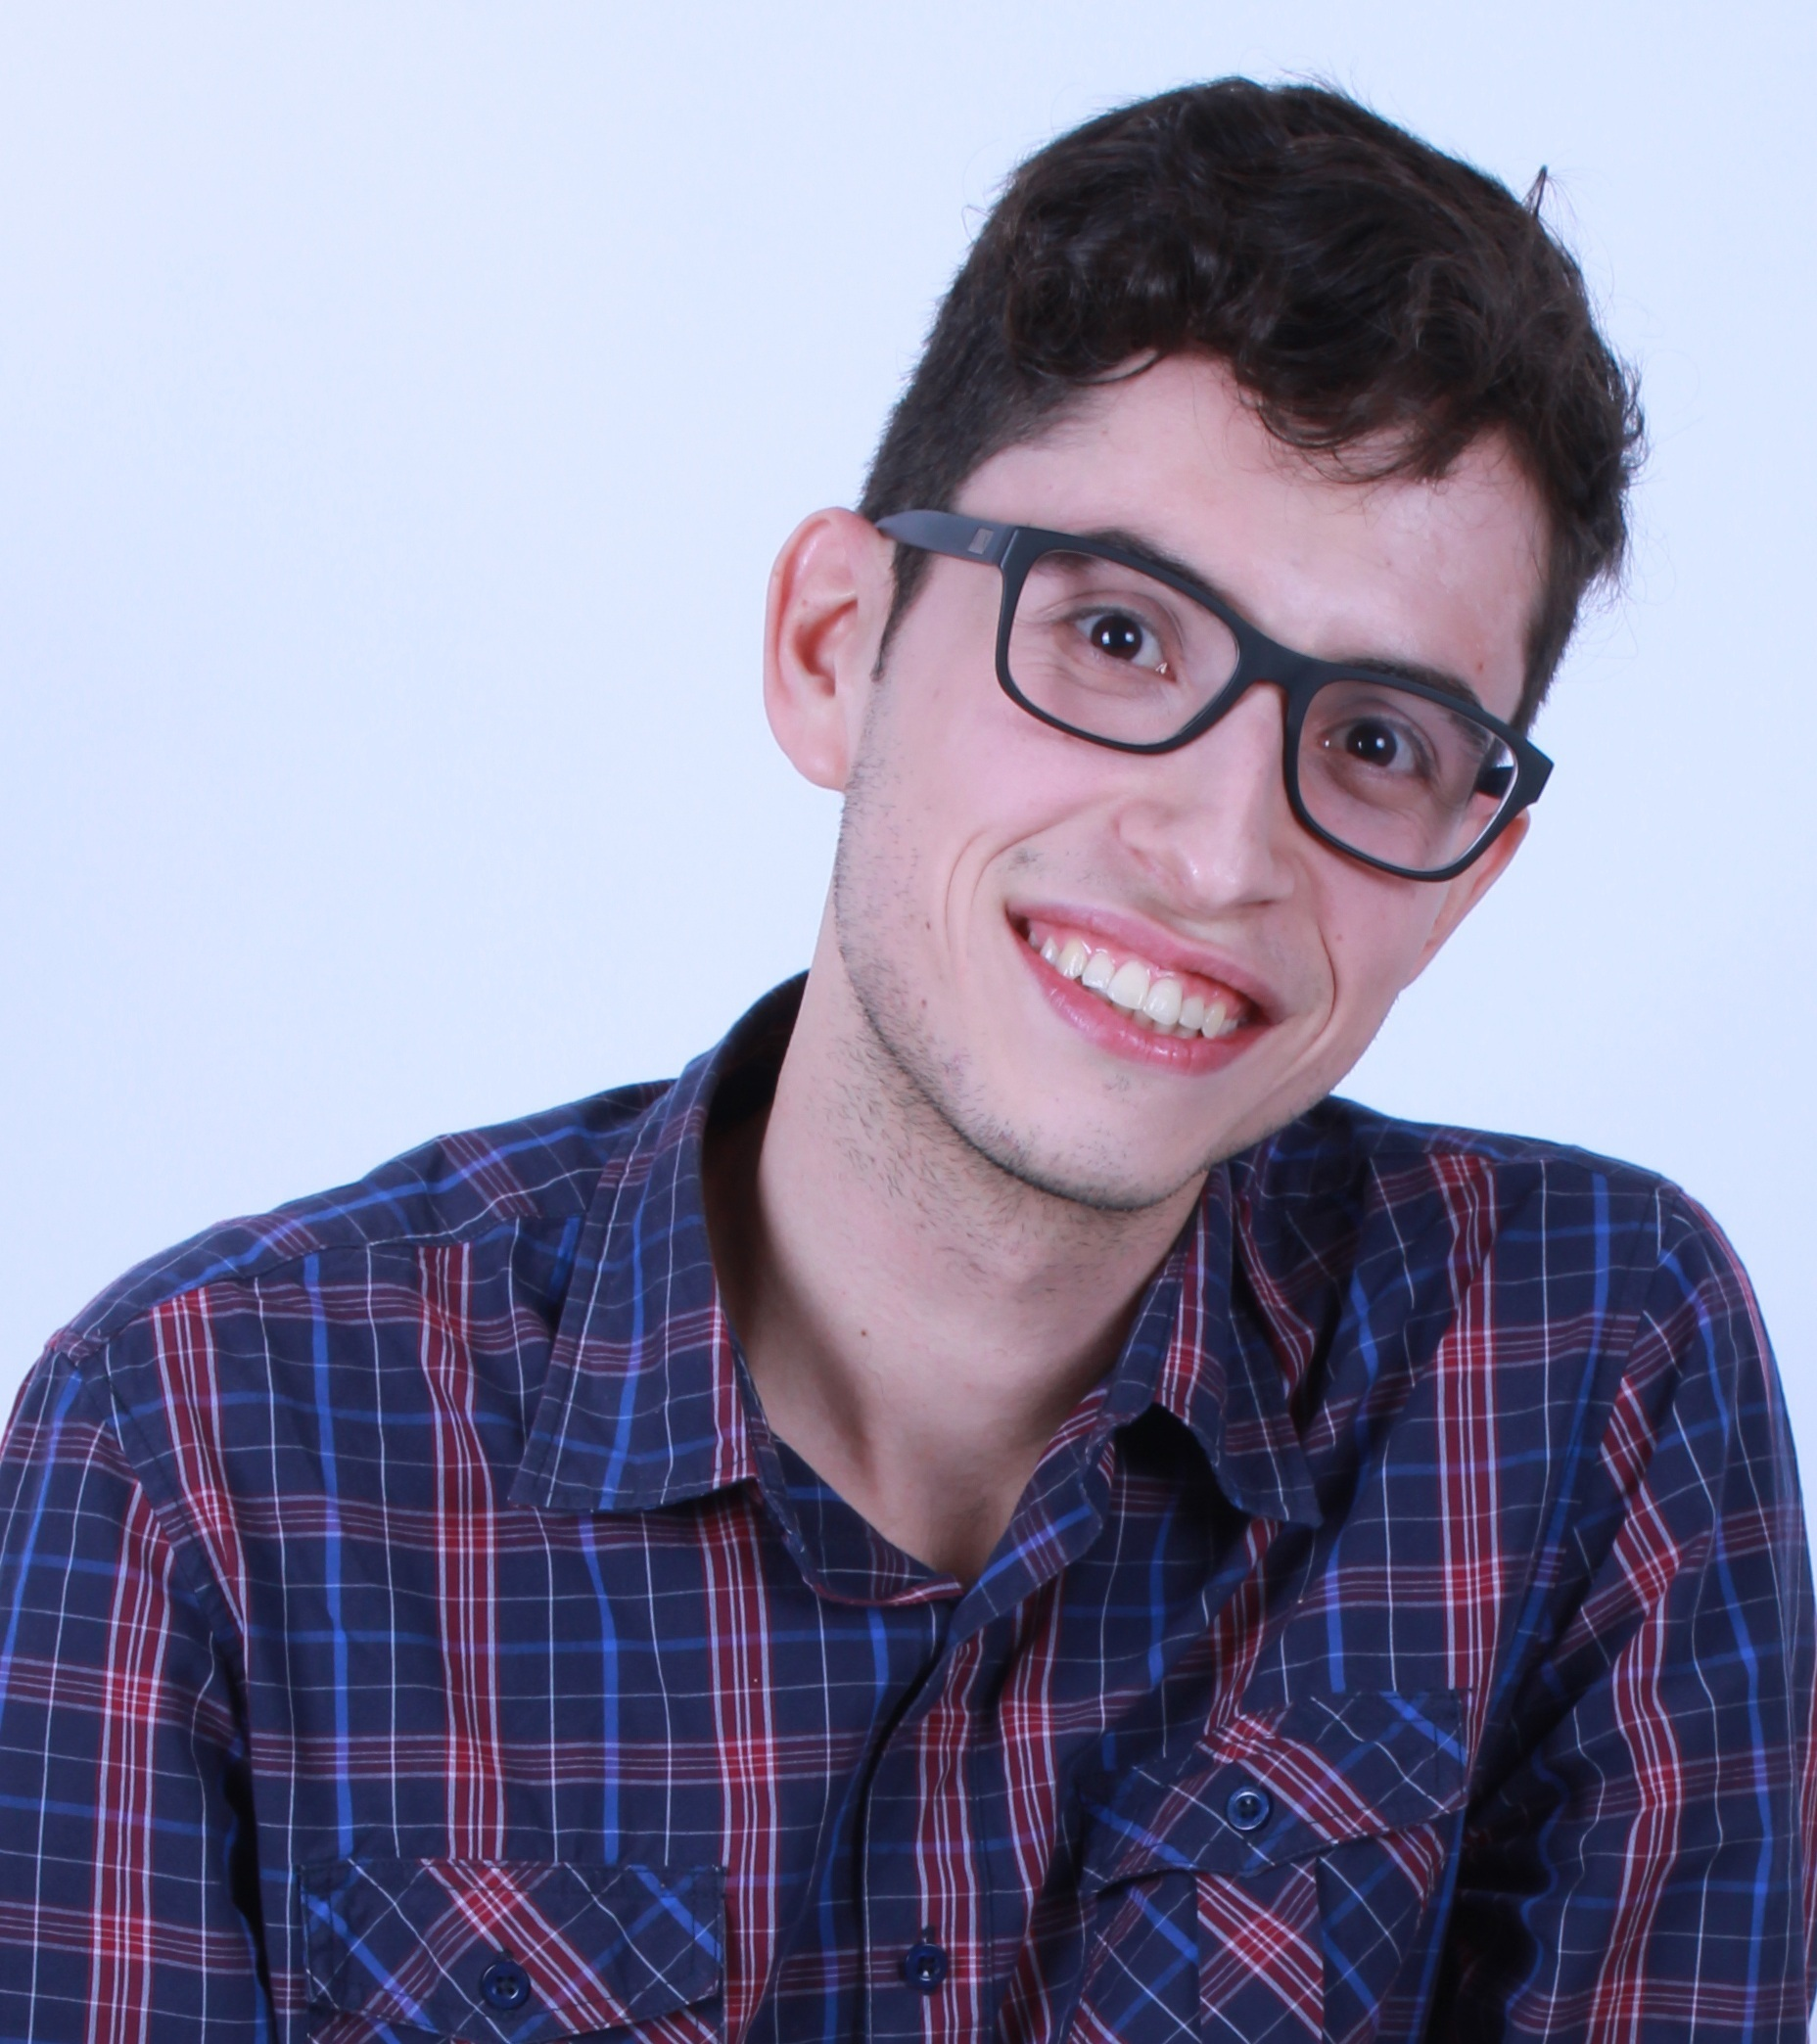 Hugo Marcos Alves Vilhena Souza